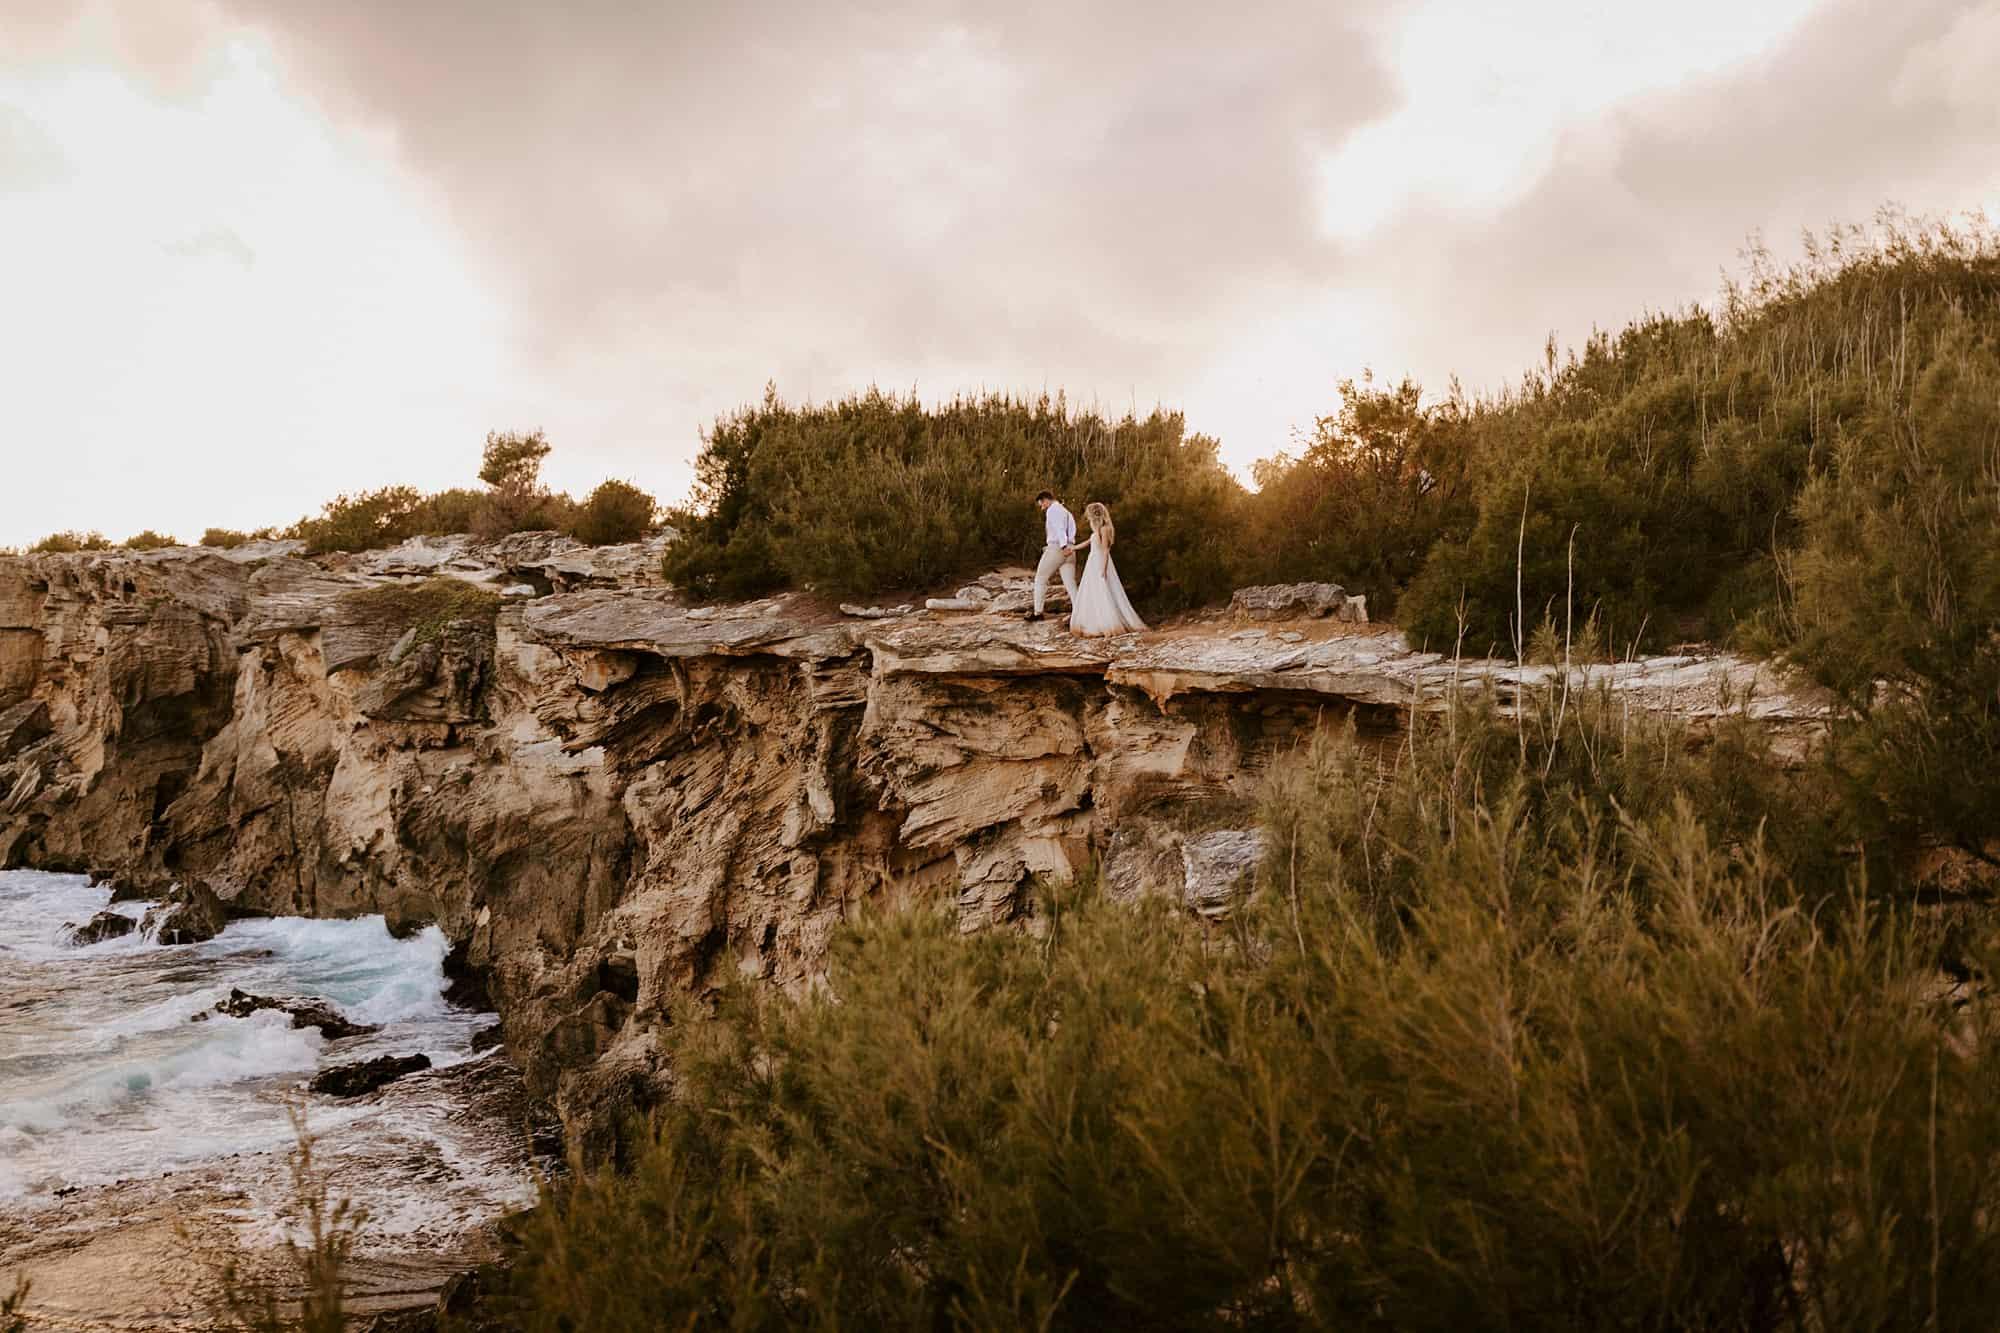 Kauai Hawaii Romantic Intimate Wedding Shipwreck Beach Adventure Portraits